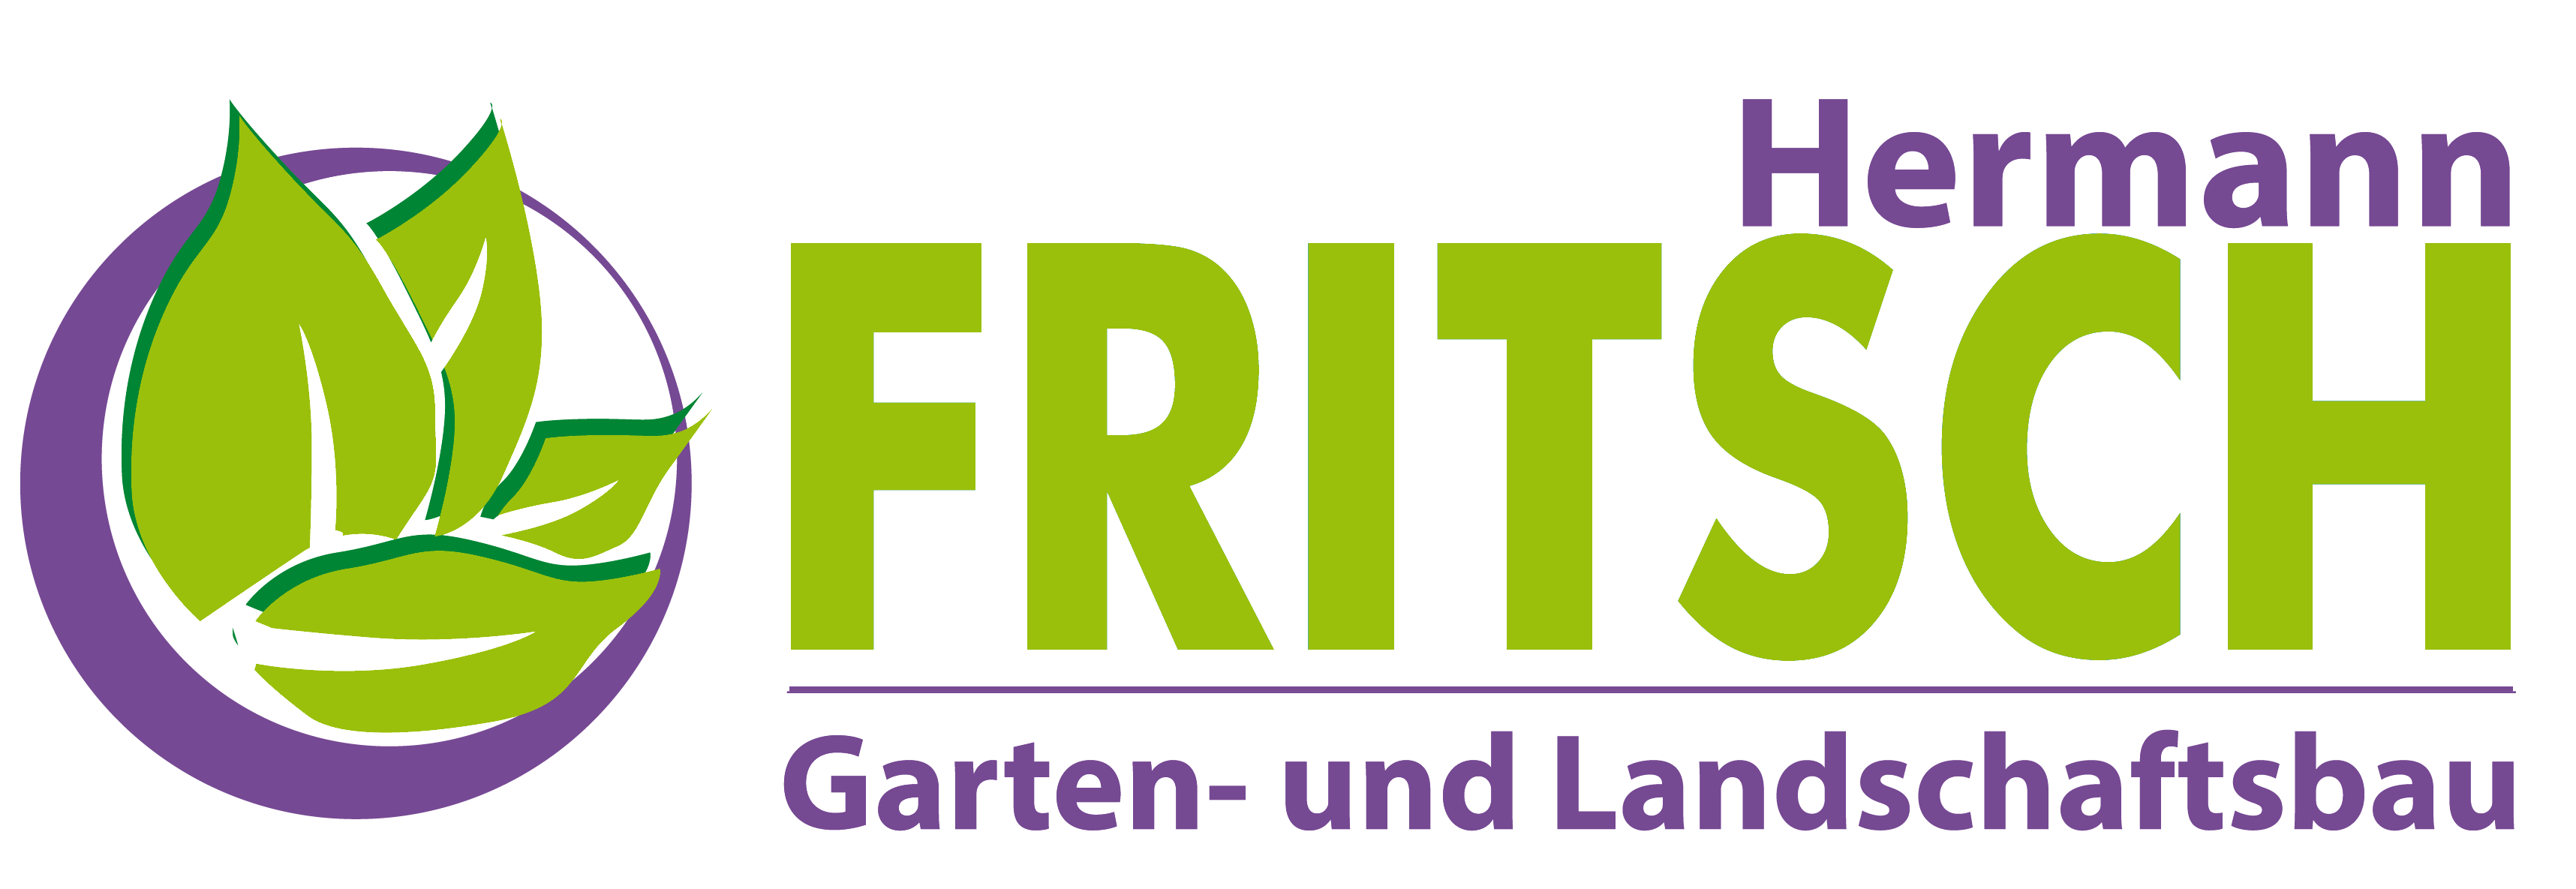 Kontakt Fritsch Gartenbau, Gartengestaltung